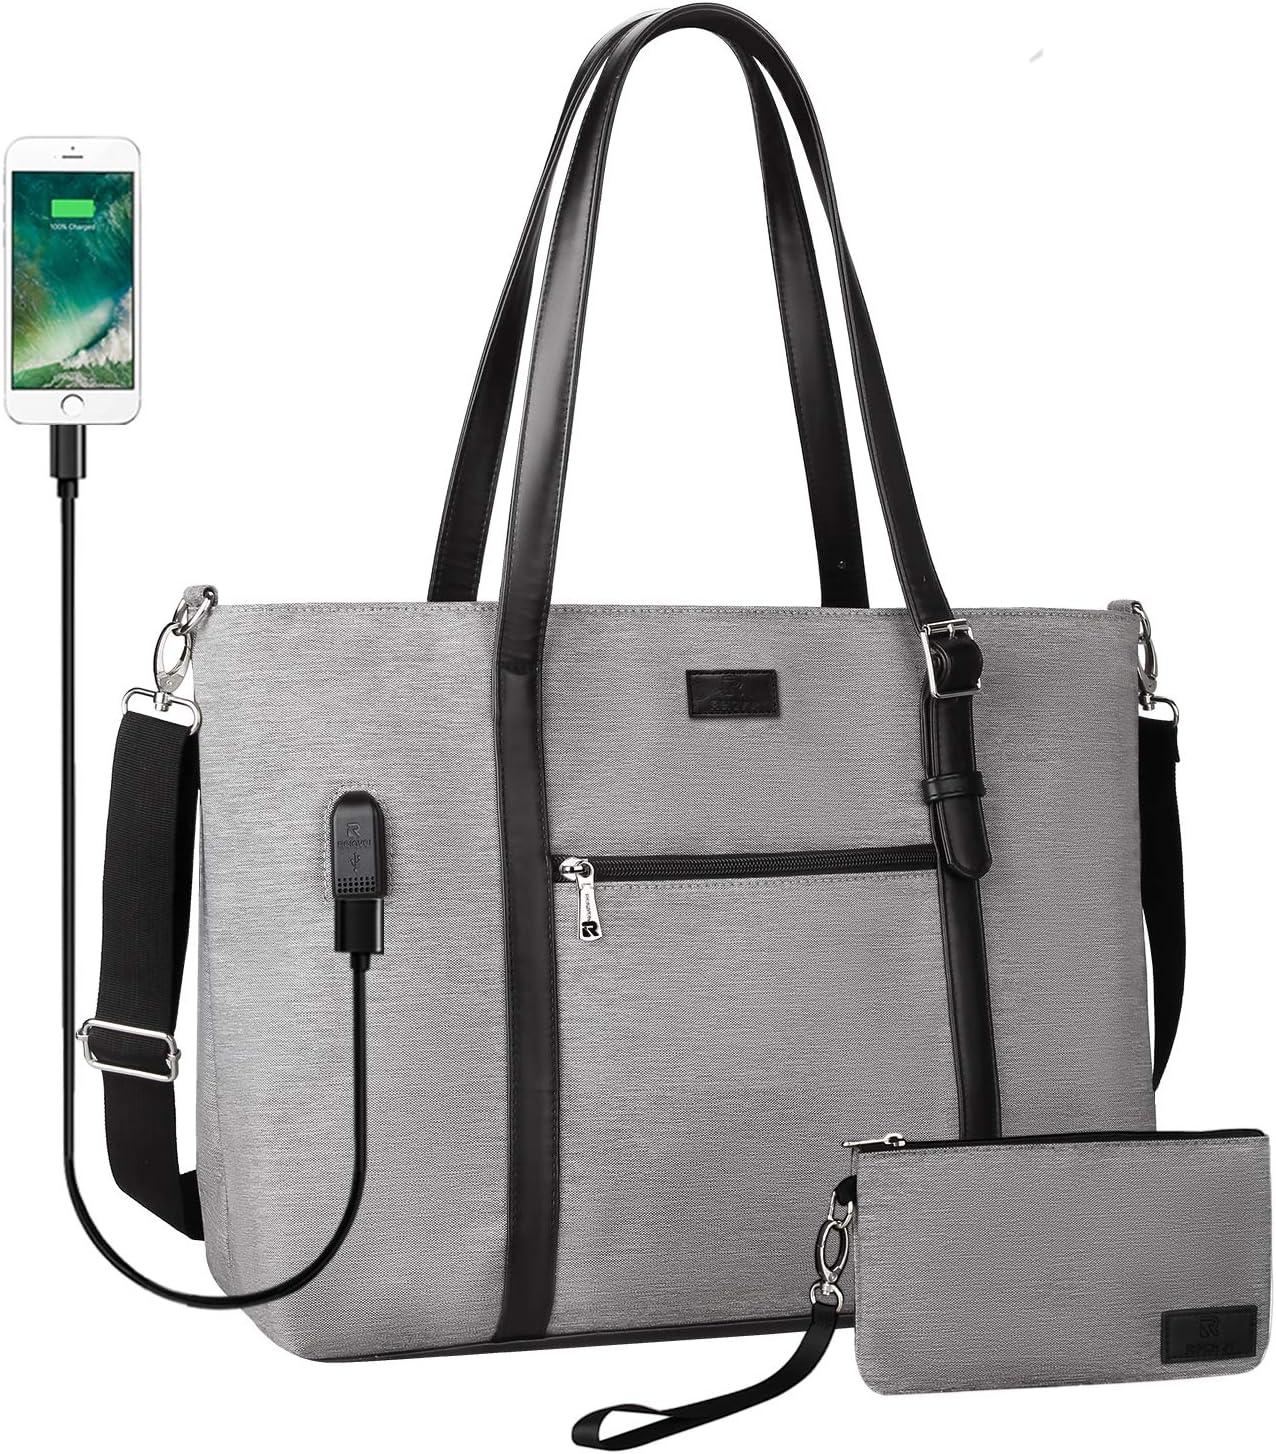 Laptop Tote Bag, Large Women Work Bag Purse USB Teacher Bag Fits 17.1 Inch Laptop (XL Gray 17inch)